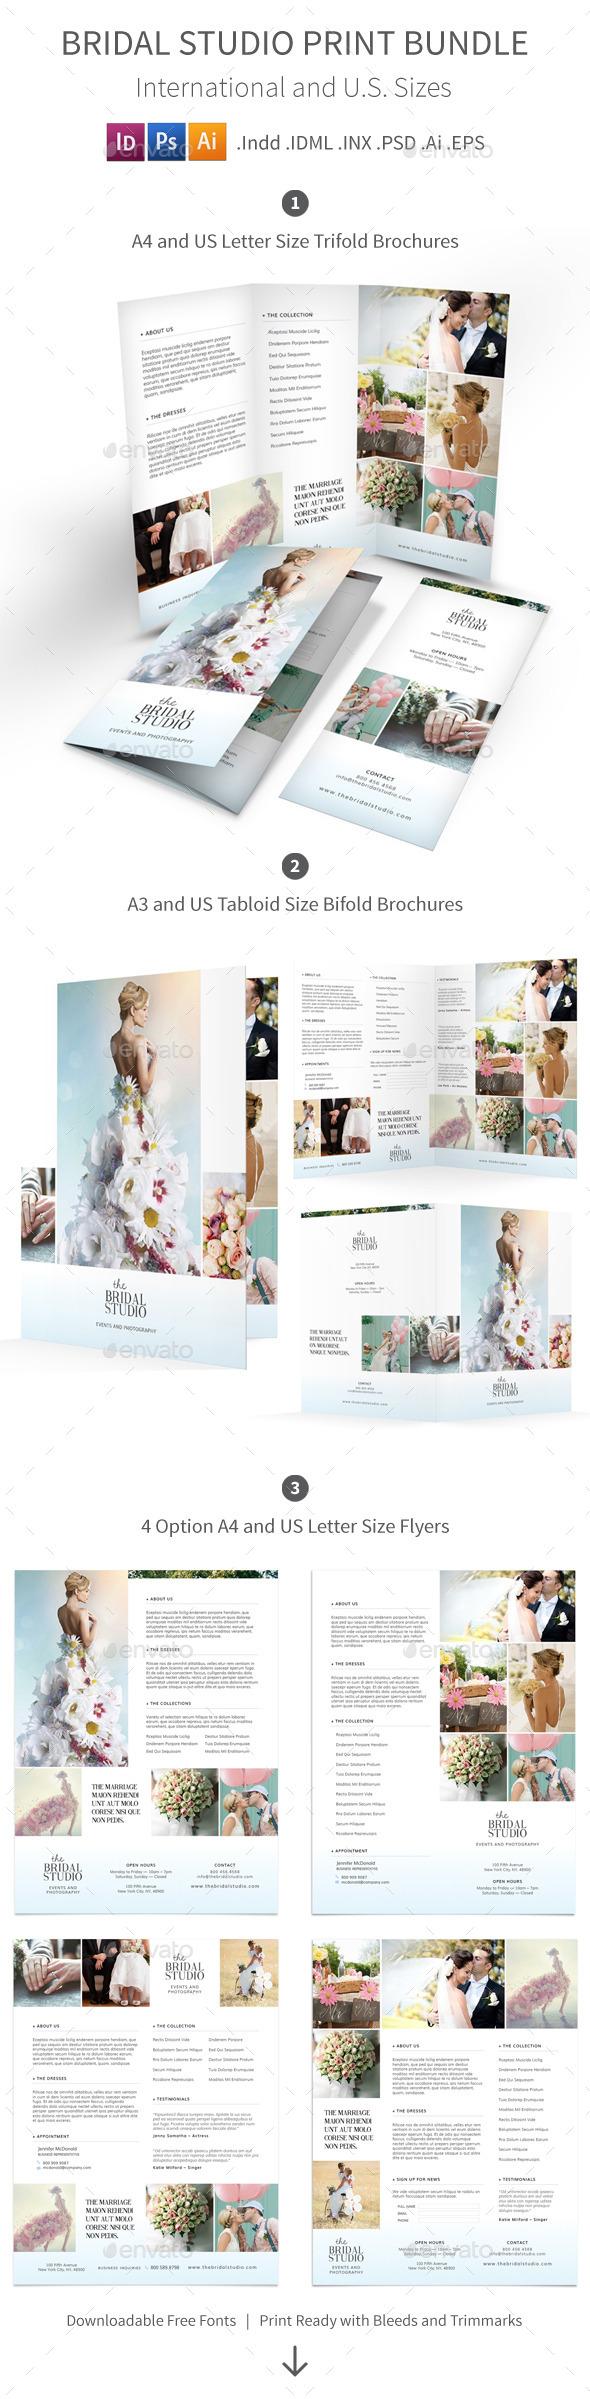 Bridal Studio Print Bundle - Informational Brochures